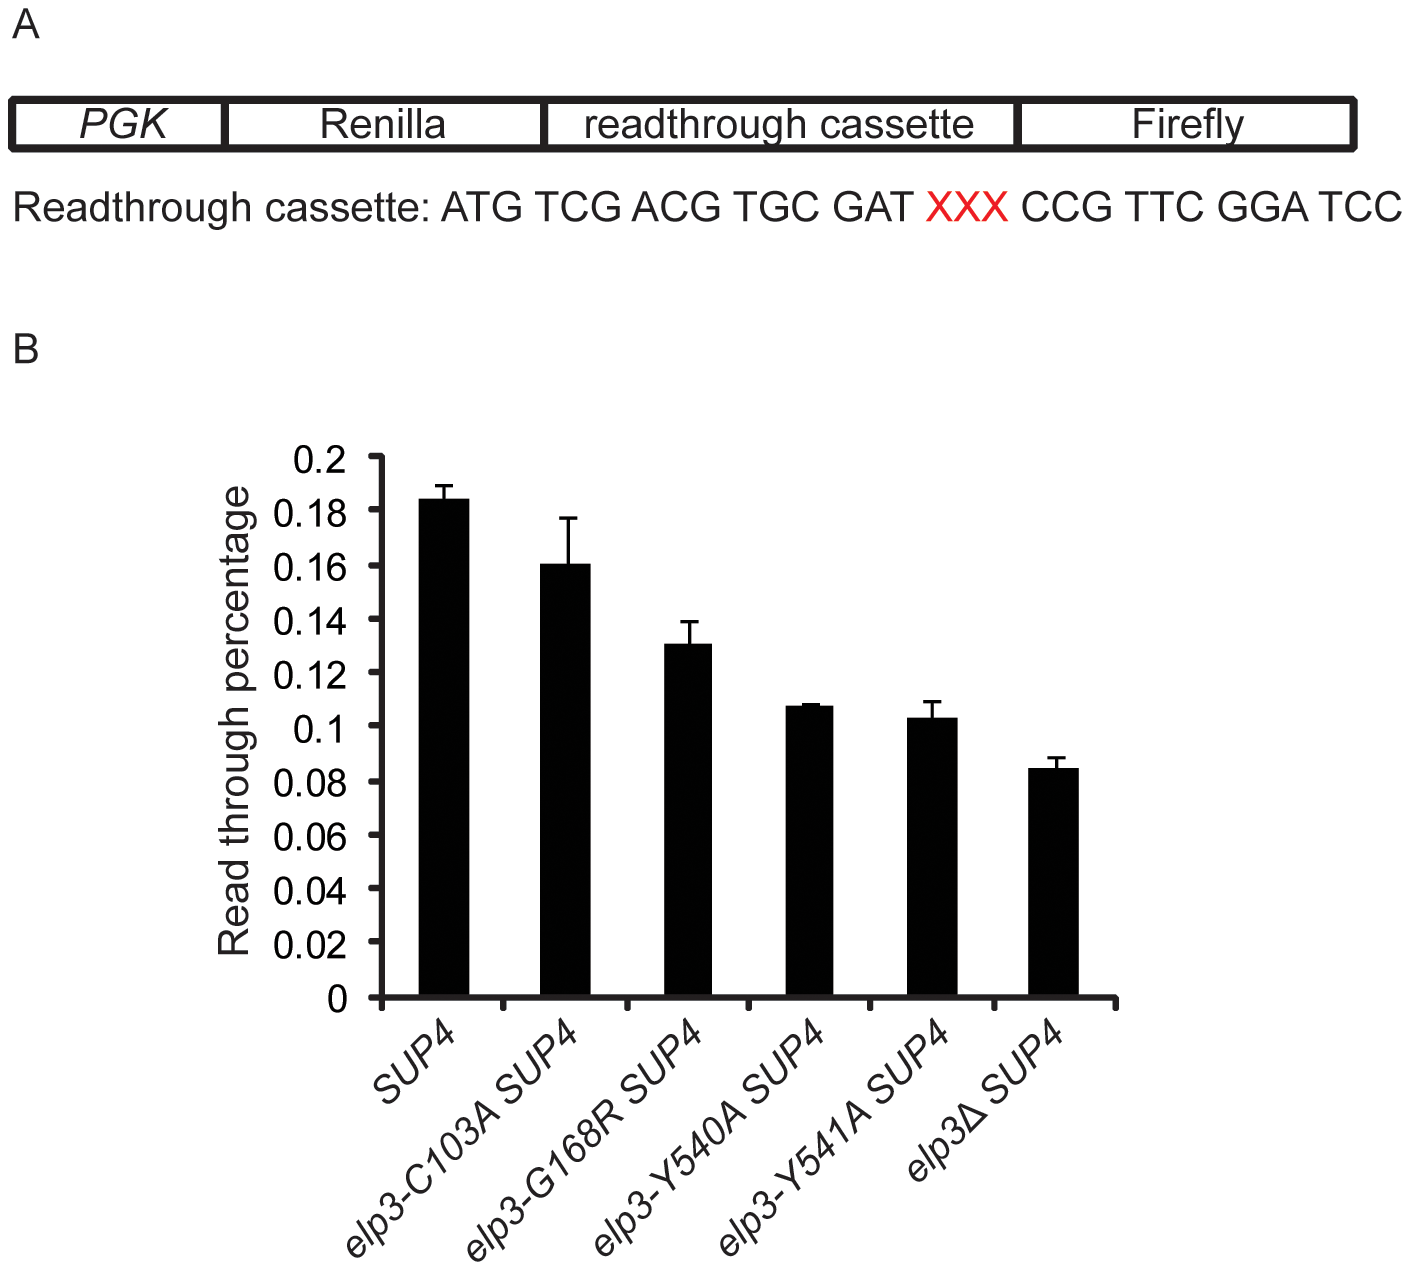 U<sub>34</sub> modification levels influence ochre stop codon read through by a suppressor tRNA.